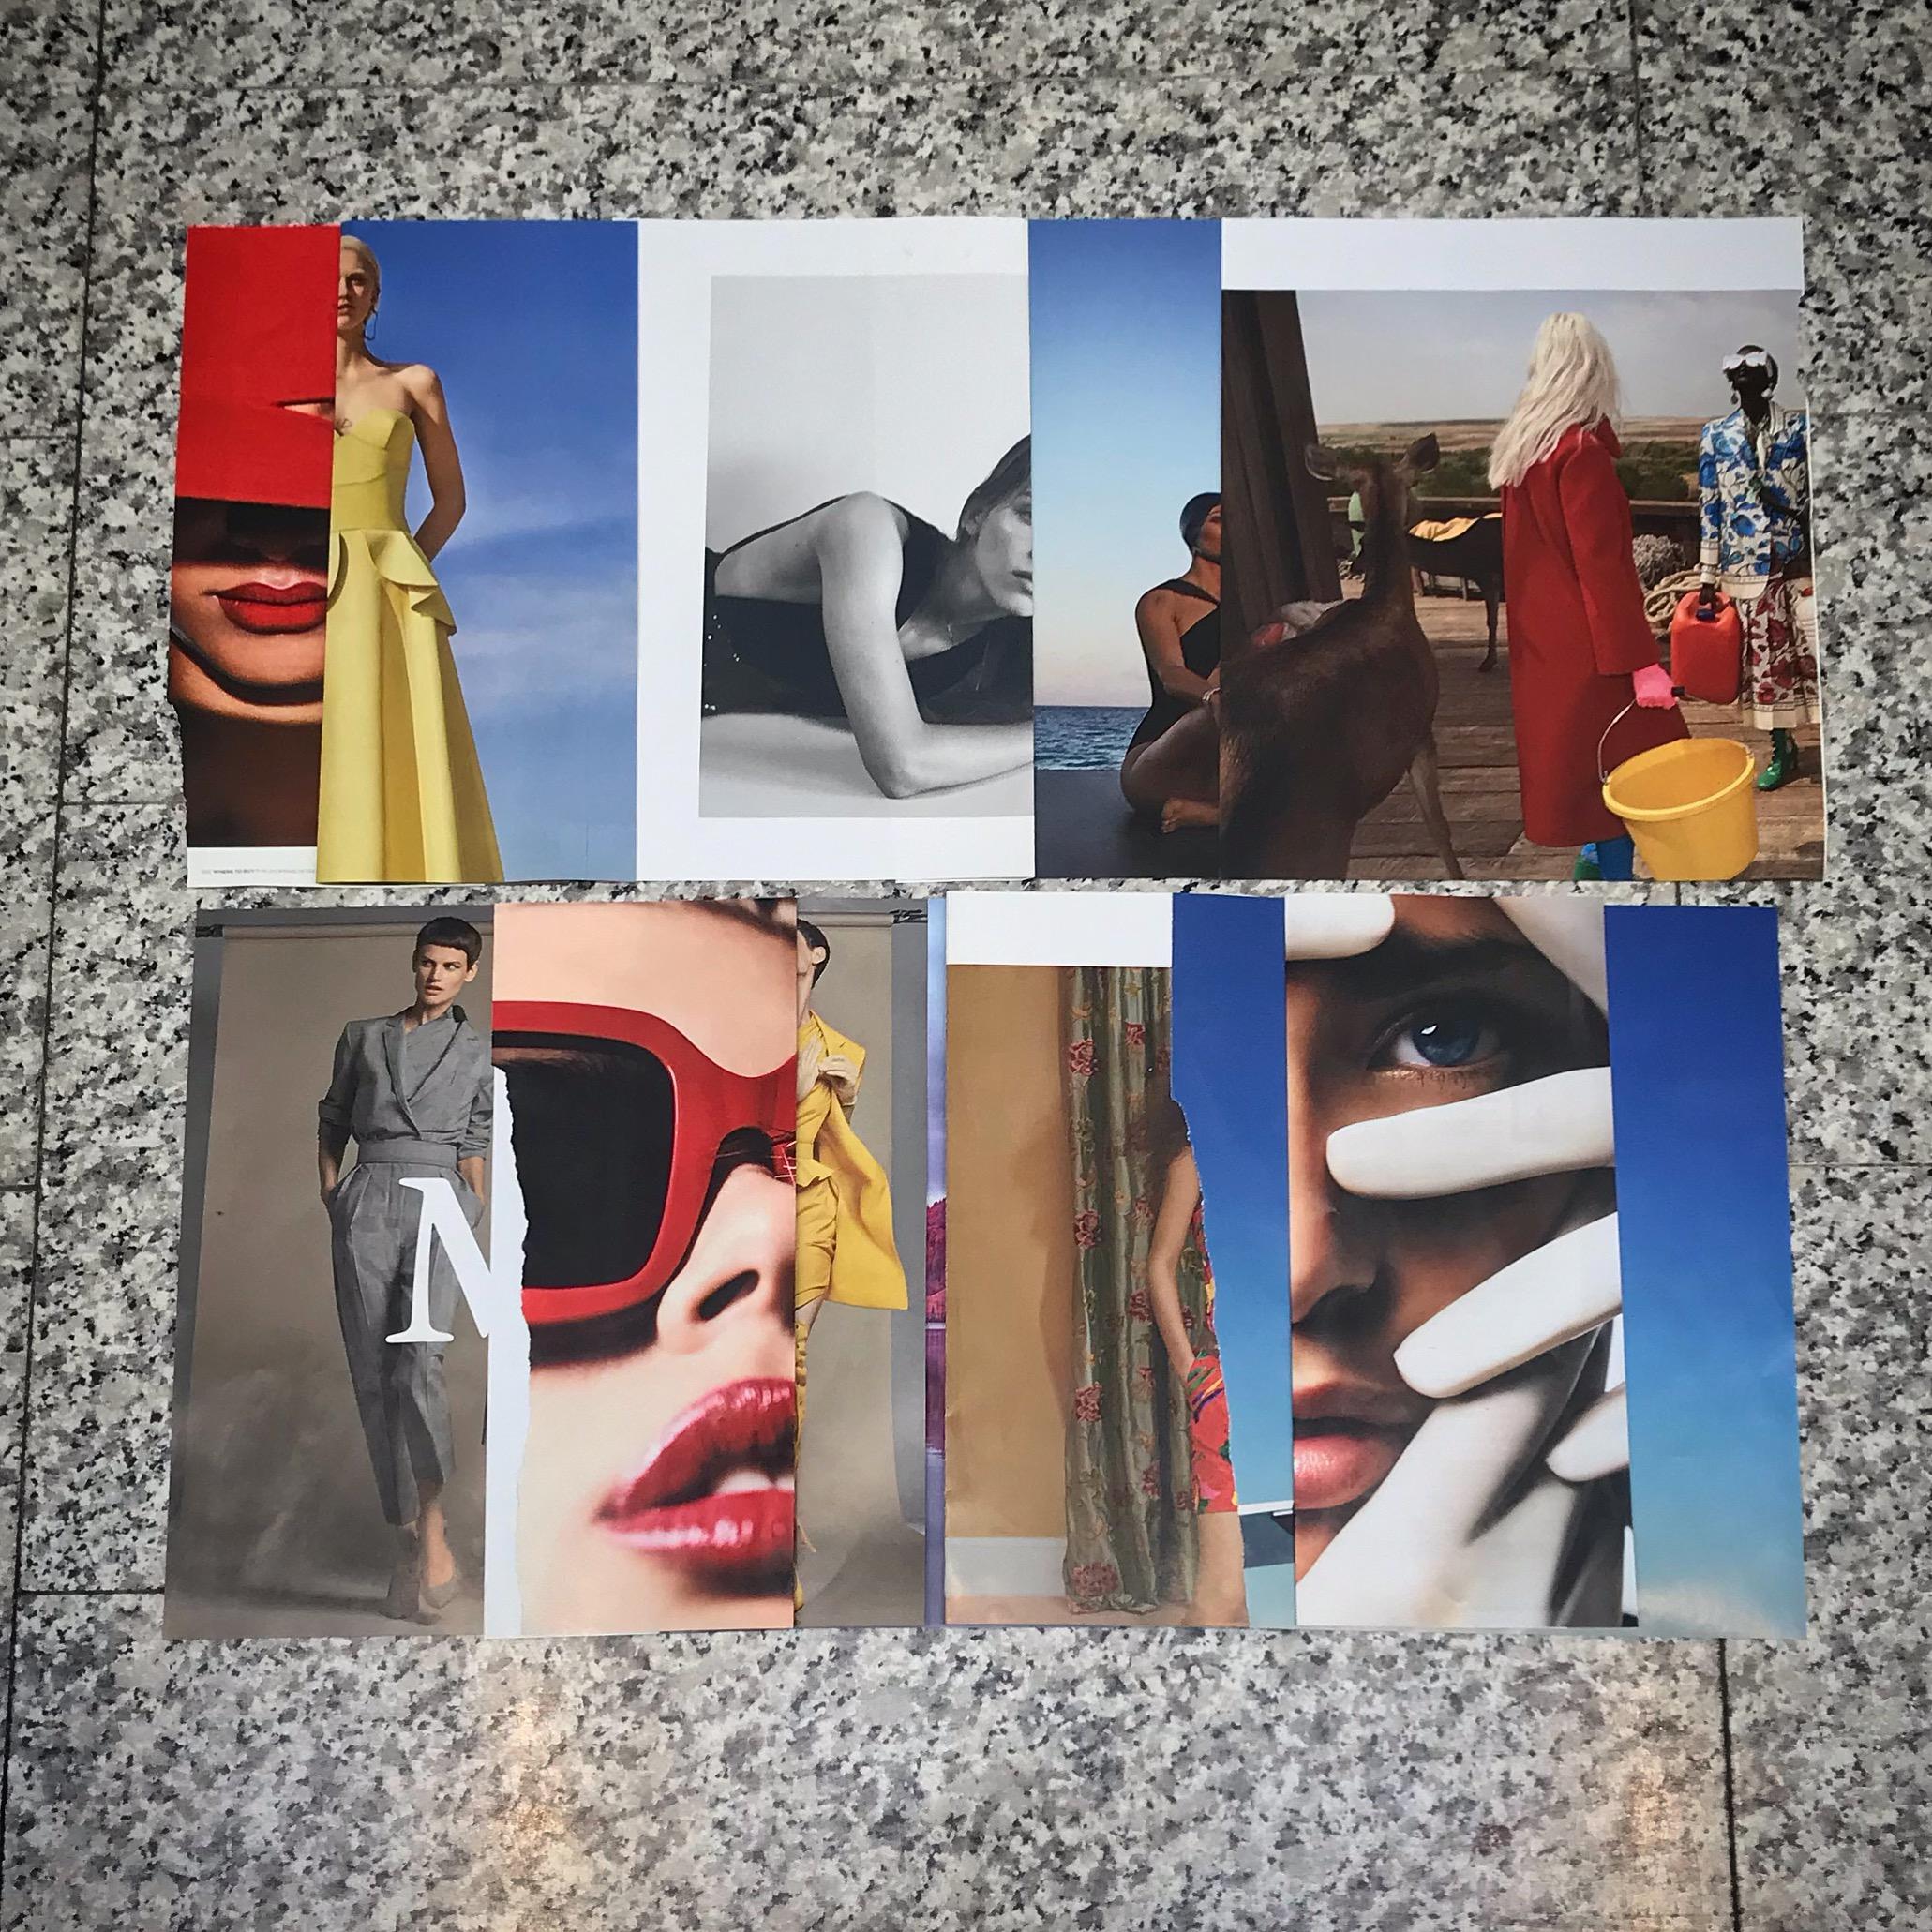 Airport Collage  Harper's Bazaar February 2019 Reimagined